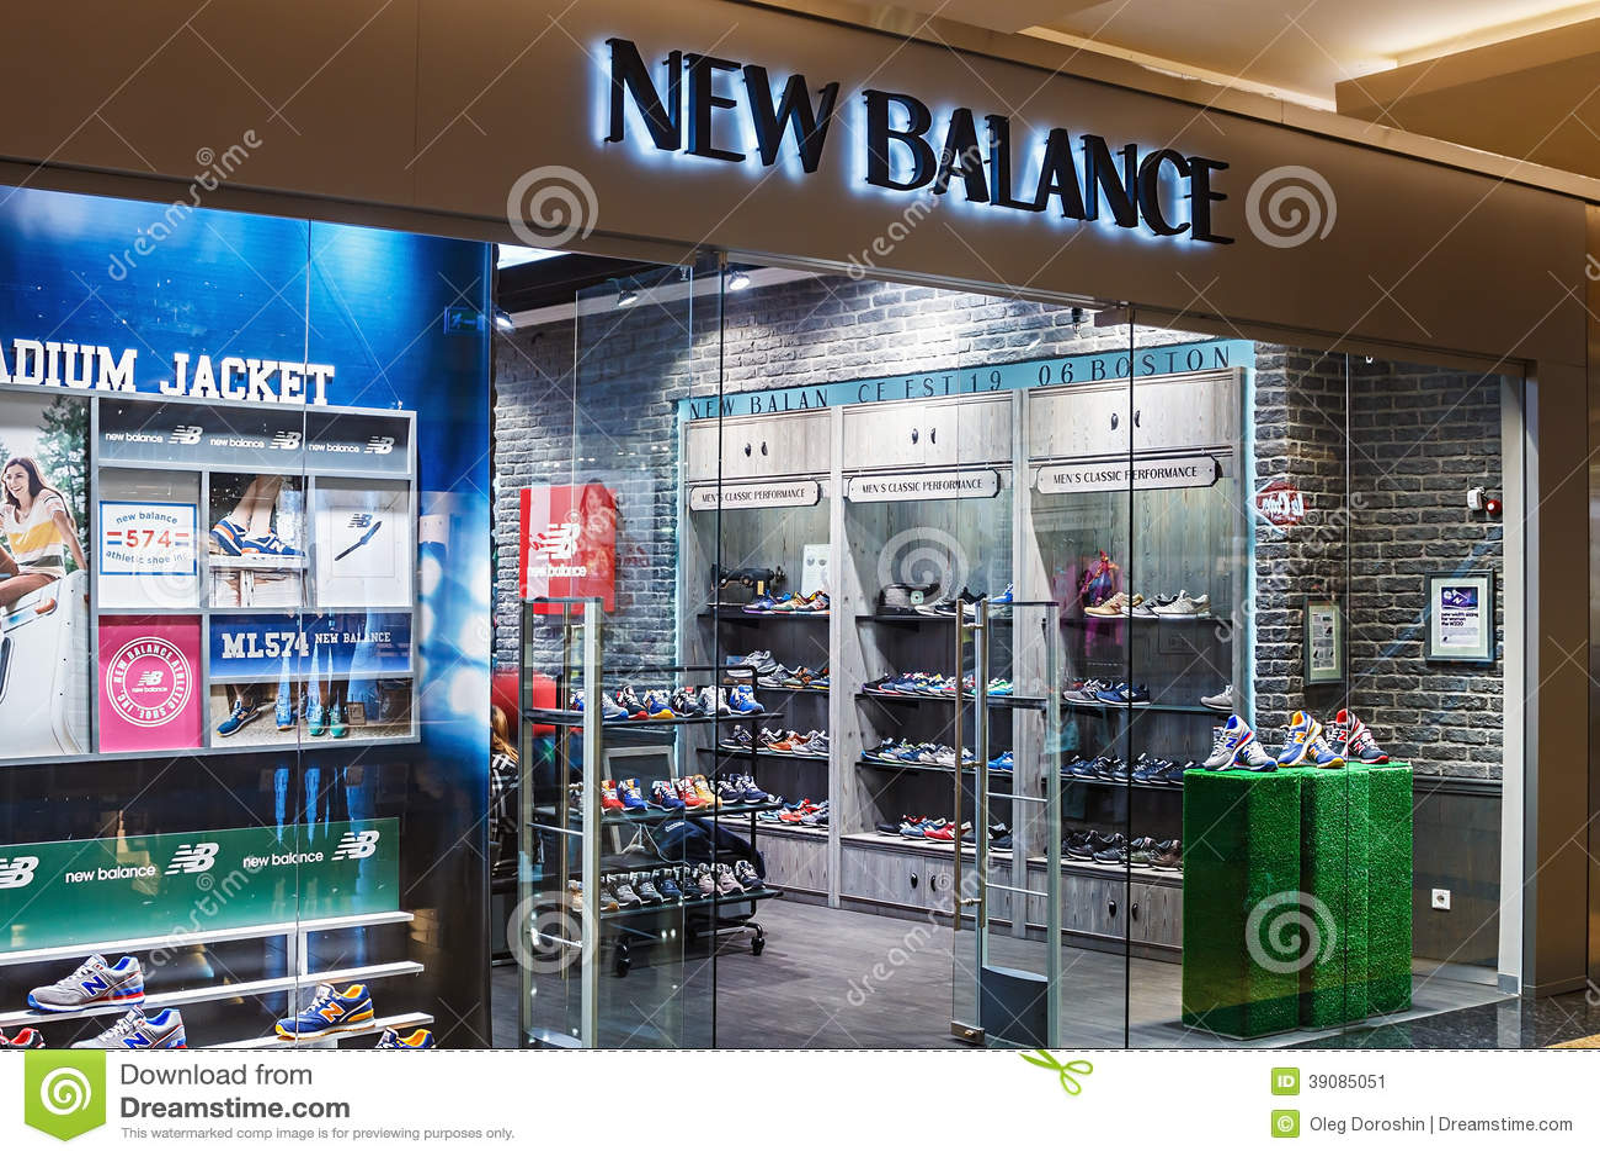 new balance tienda